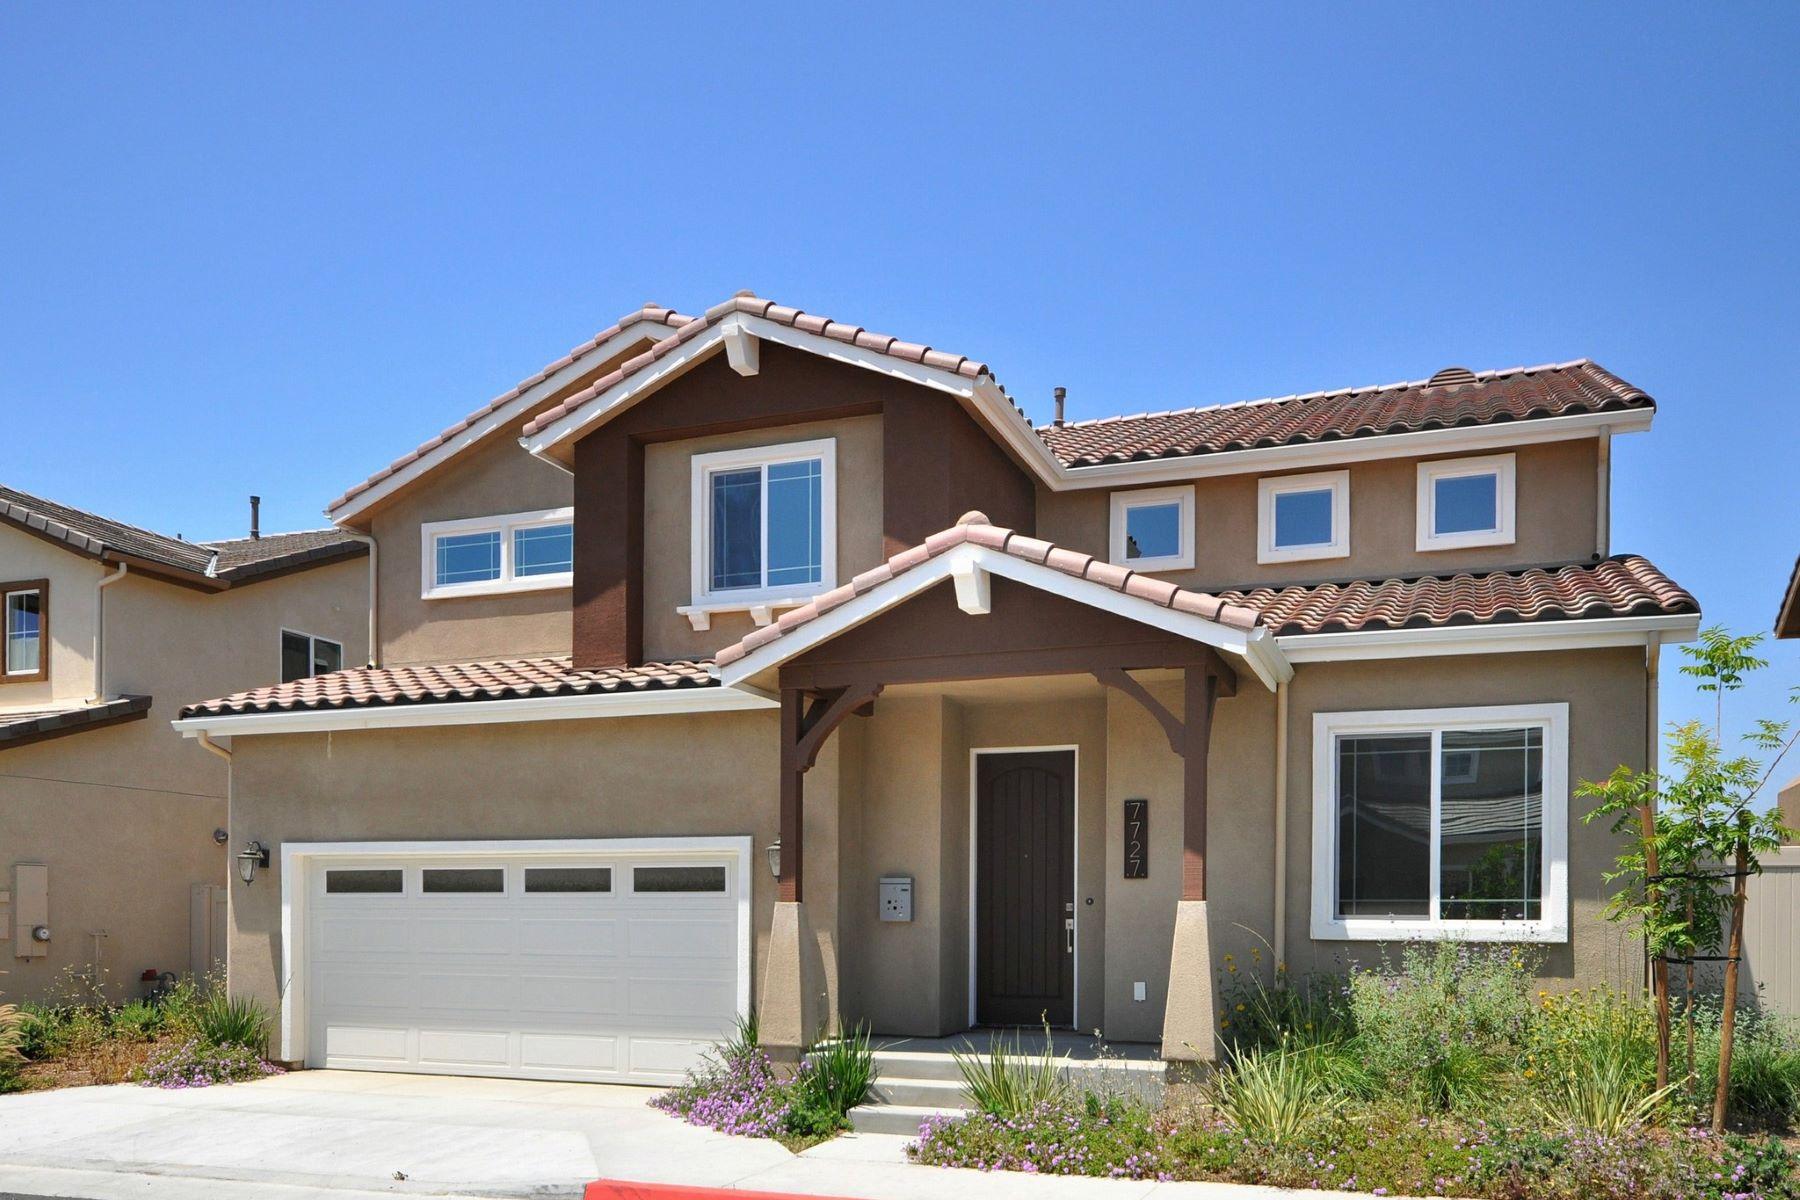 Single Family Home for Sale at 19707 Corbin Ln Winnetka, California 91306 United States